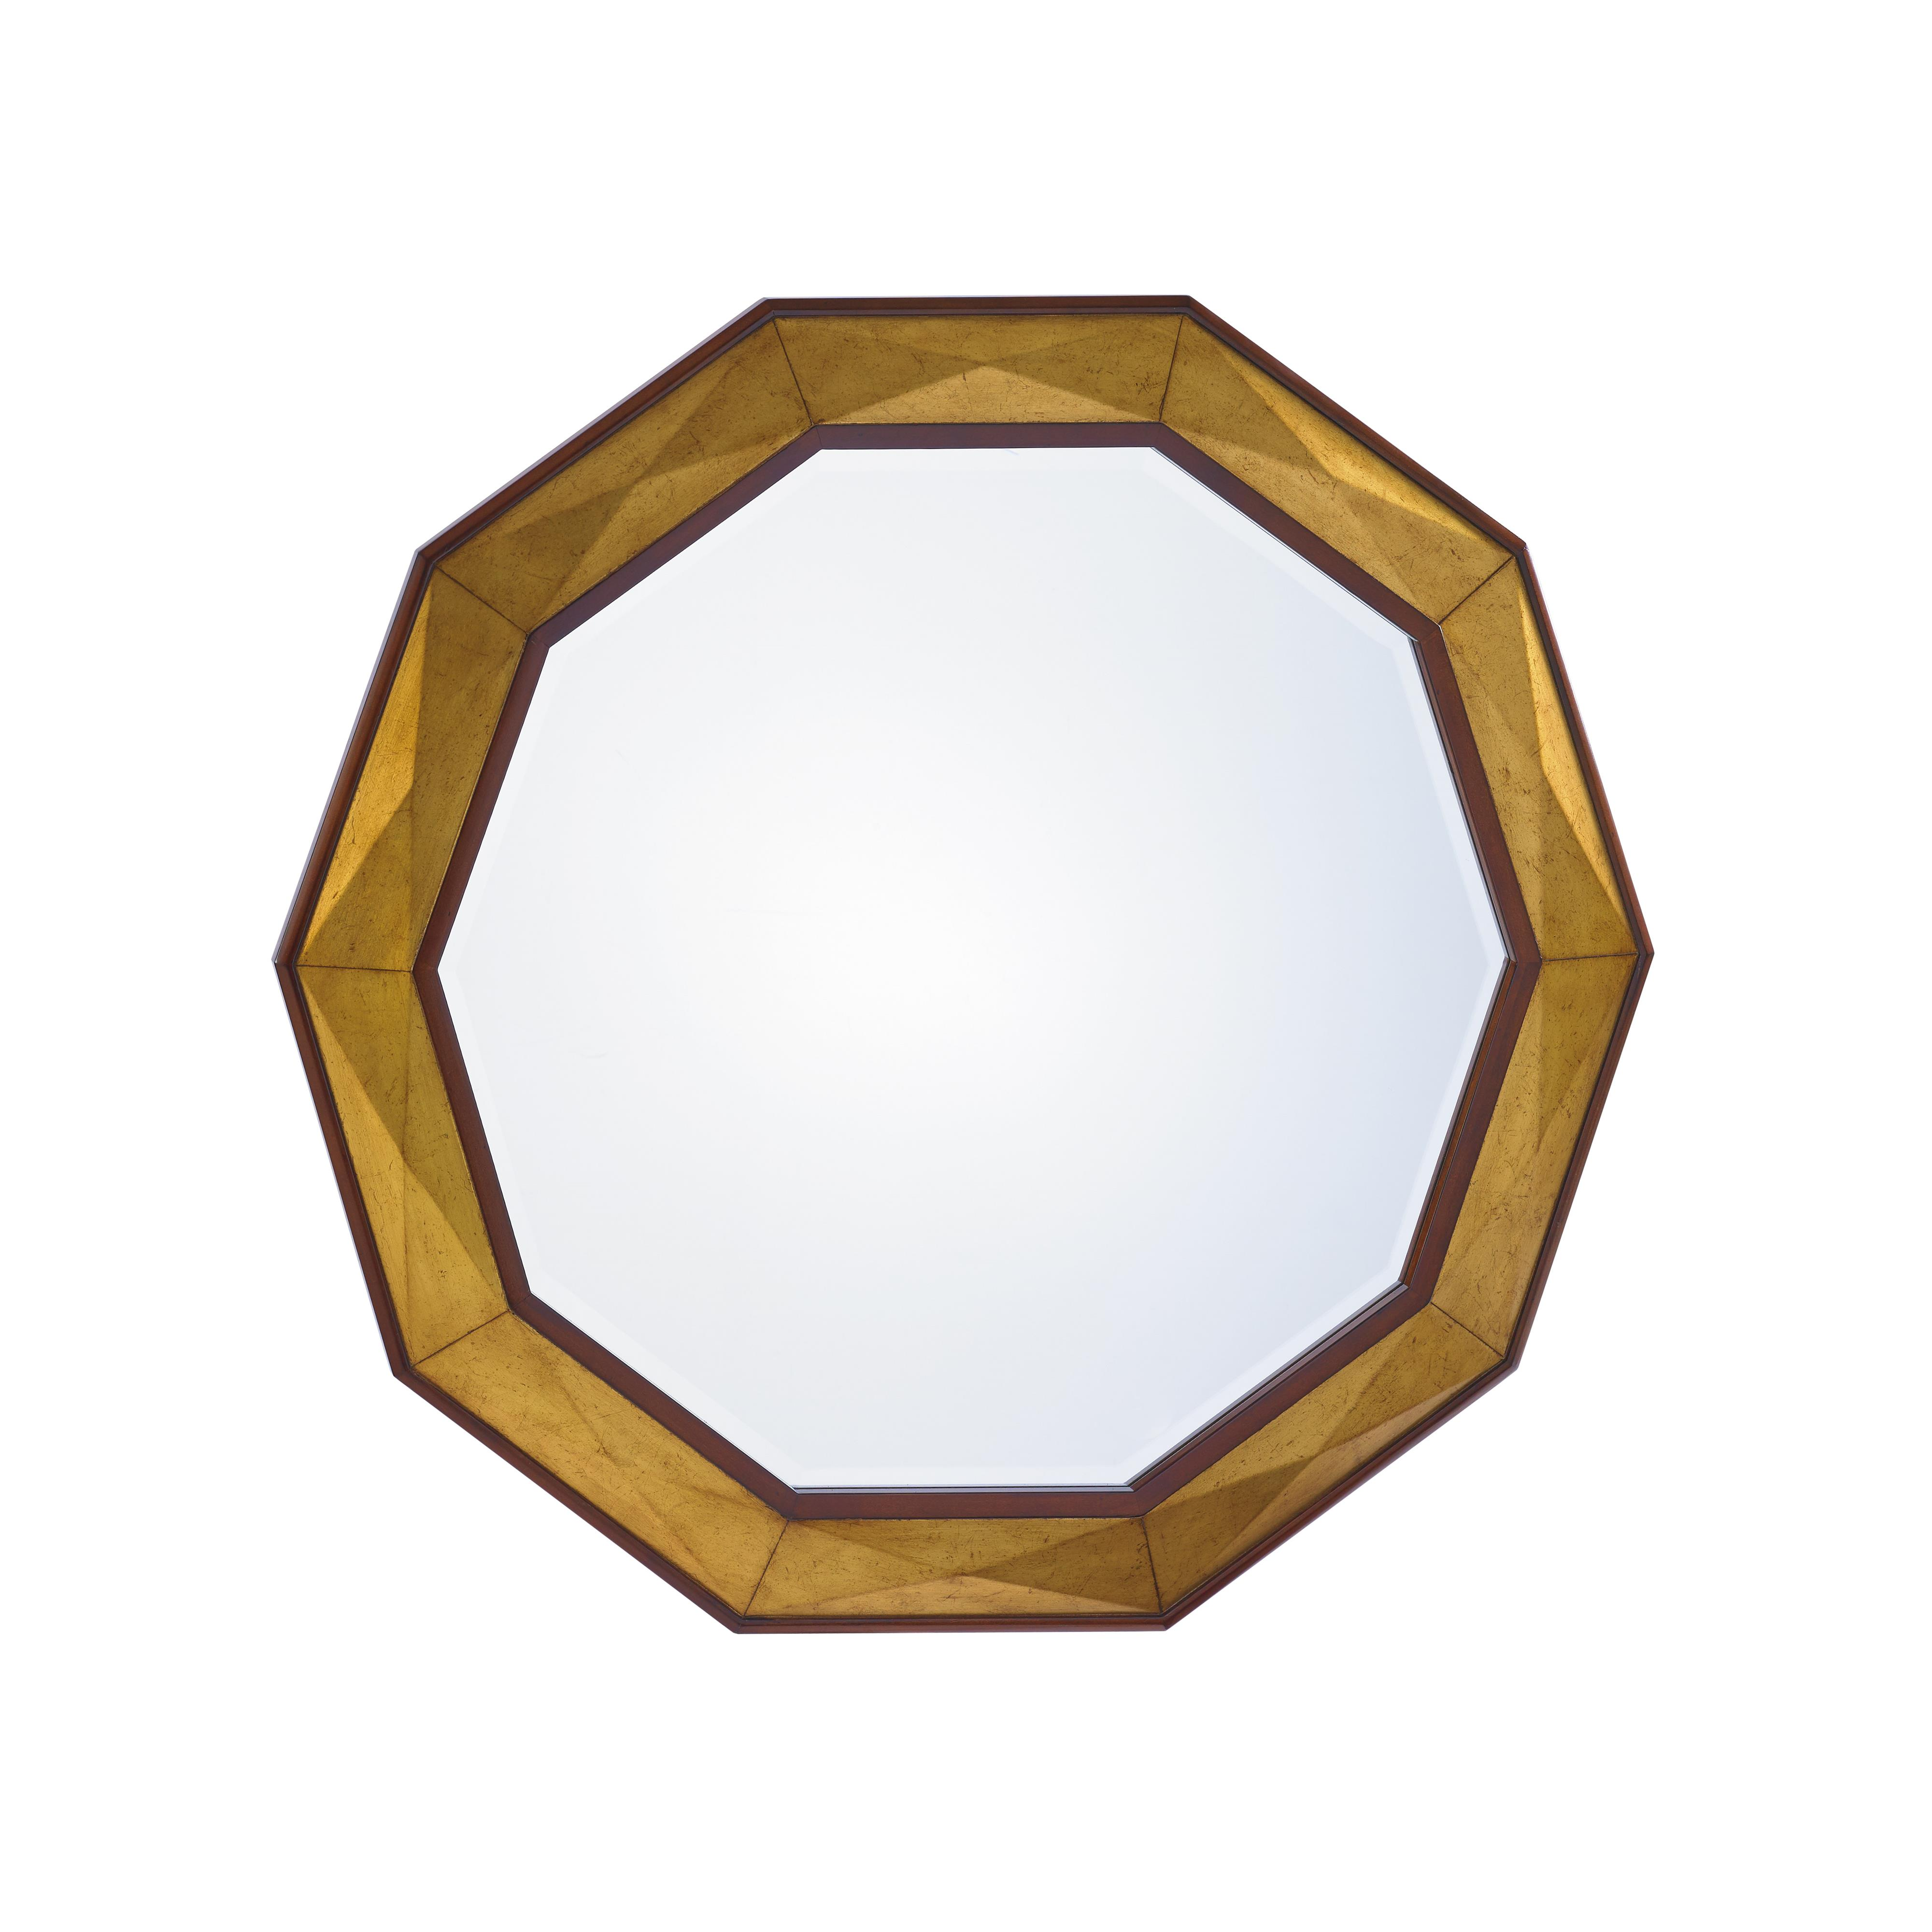 Lexington TAKE FIVE Savoy Round Mirror - Item Number: 723-201